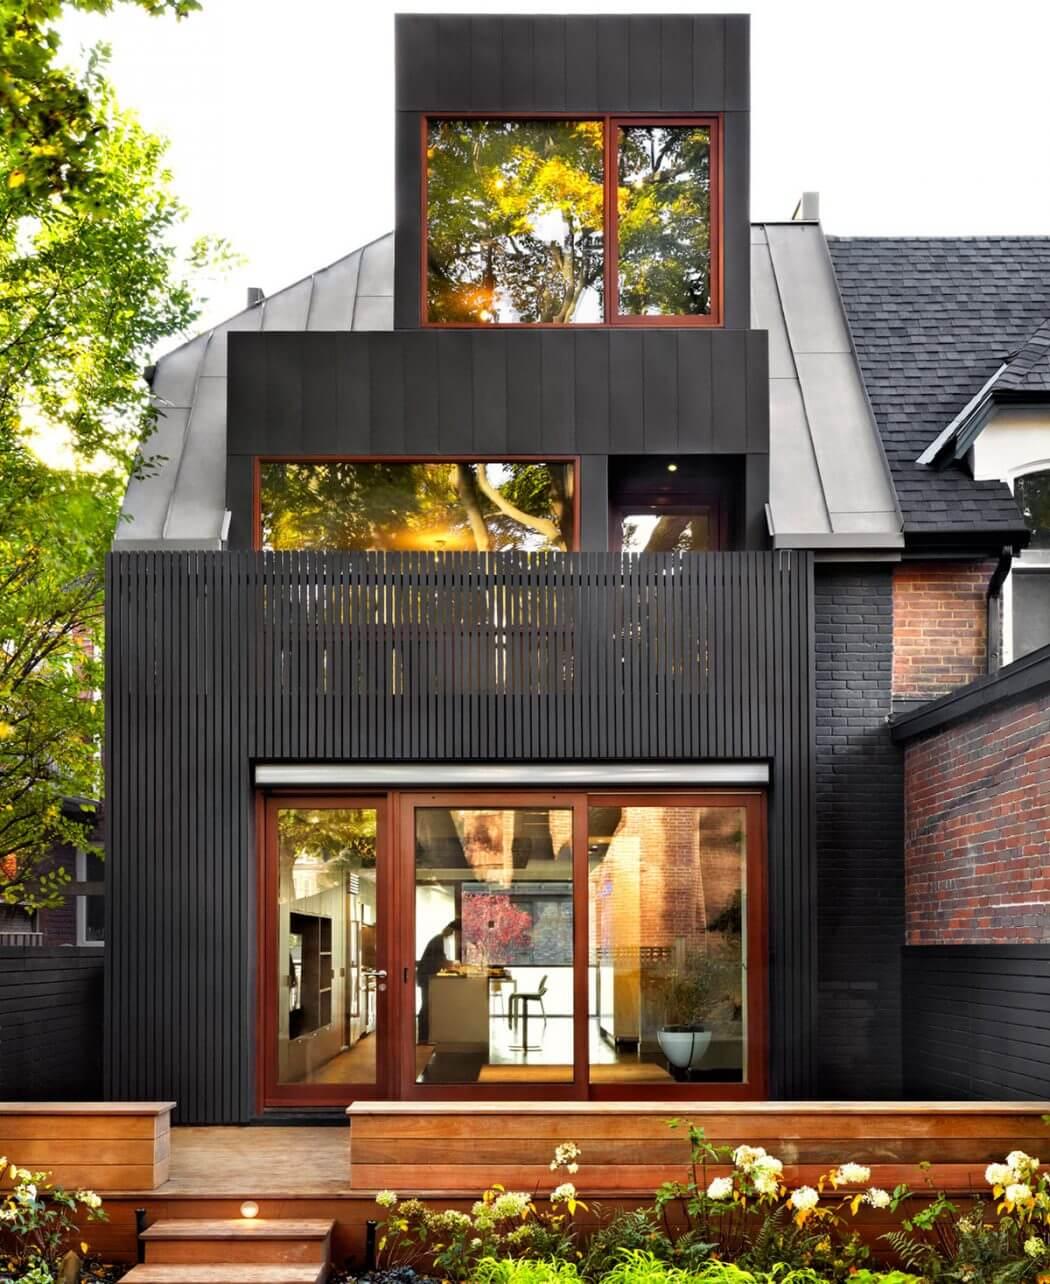 001-house-renovation-tongtong-1050x1284